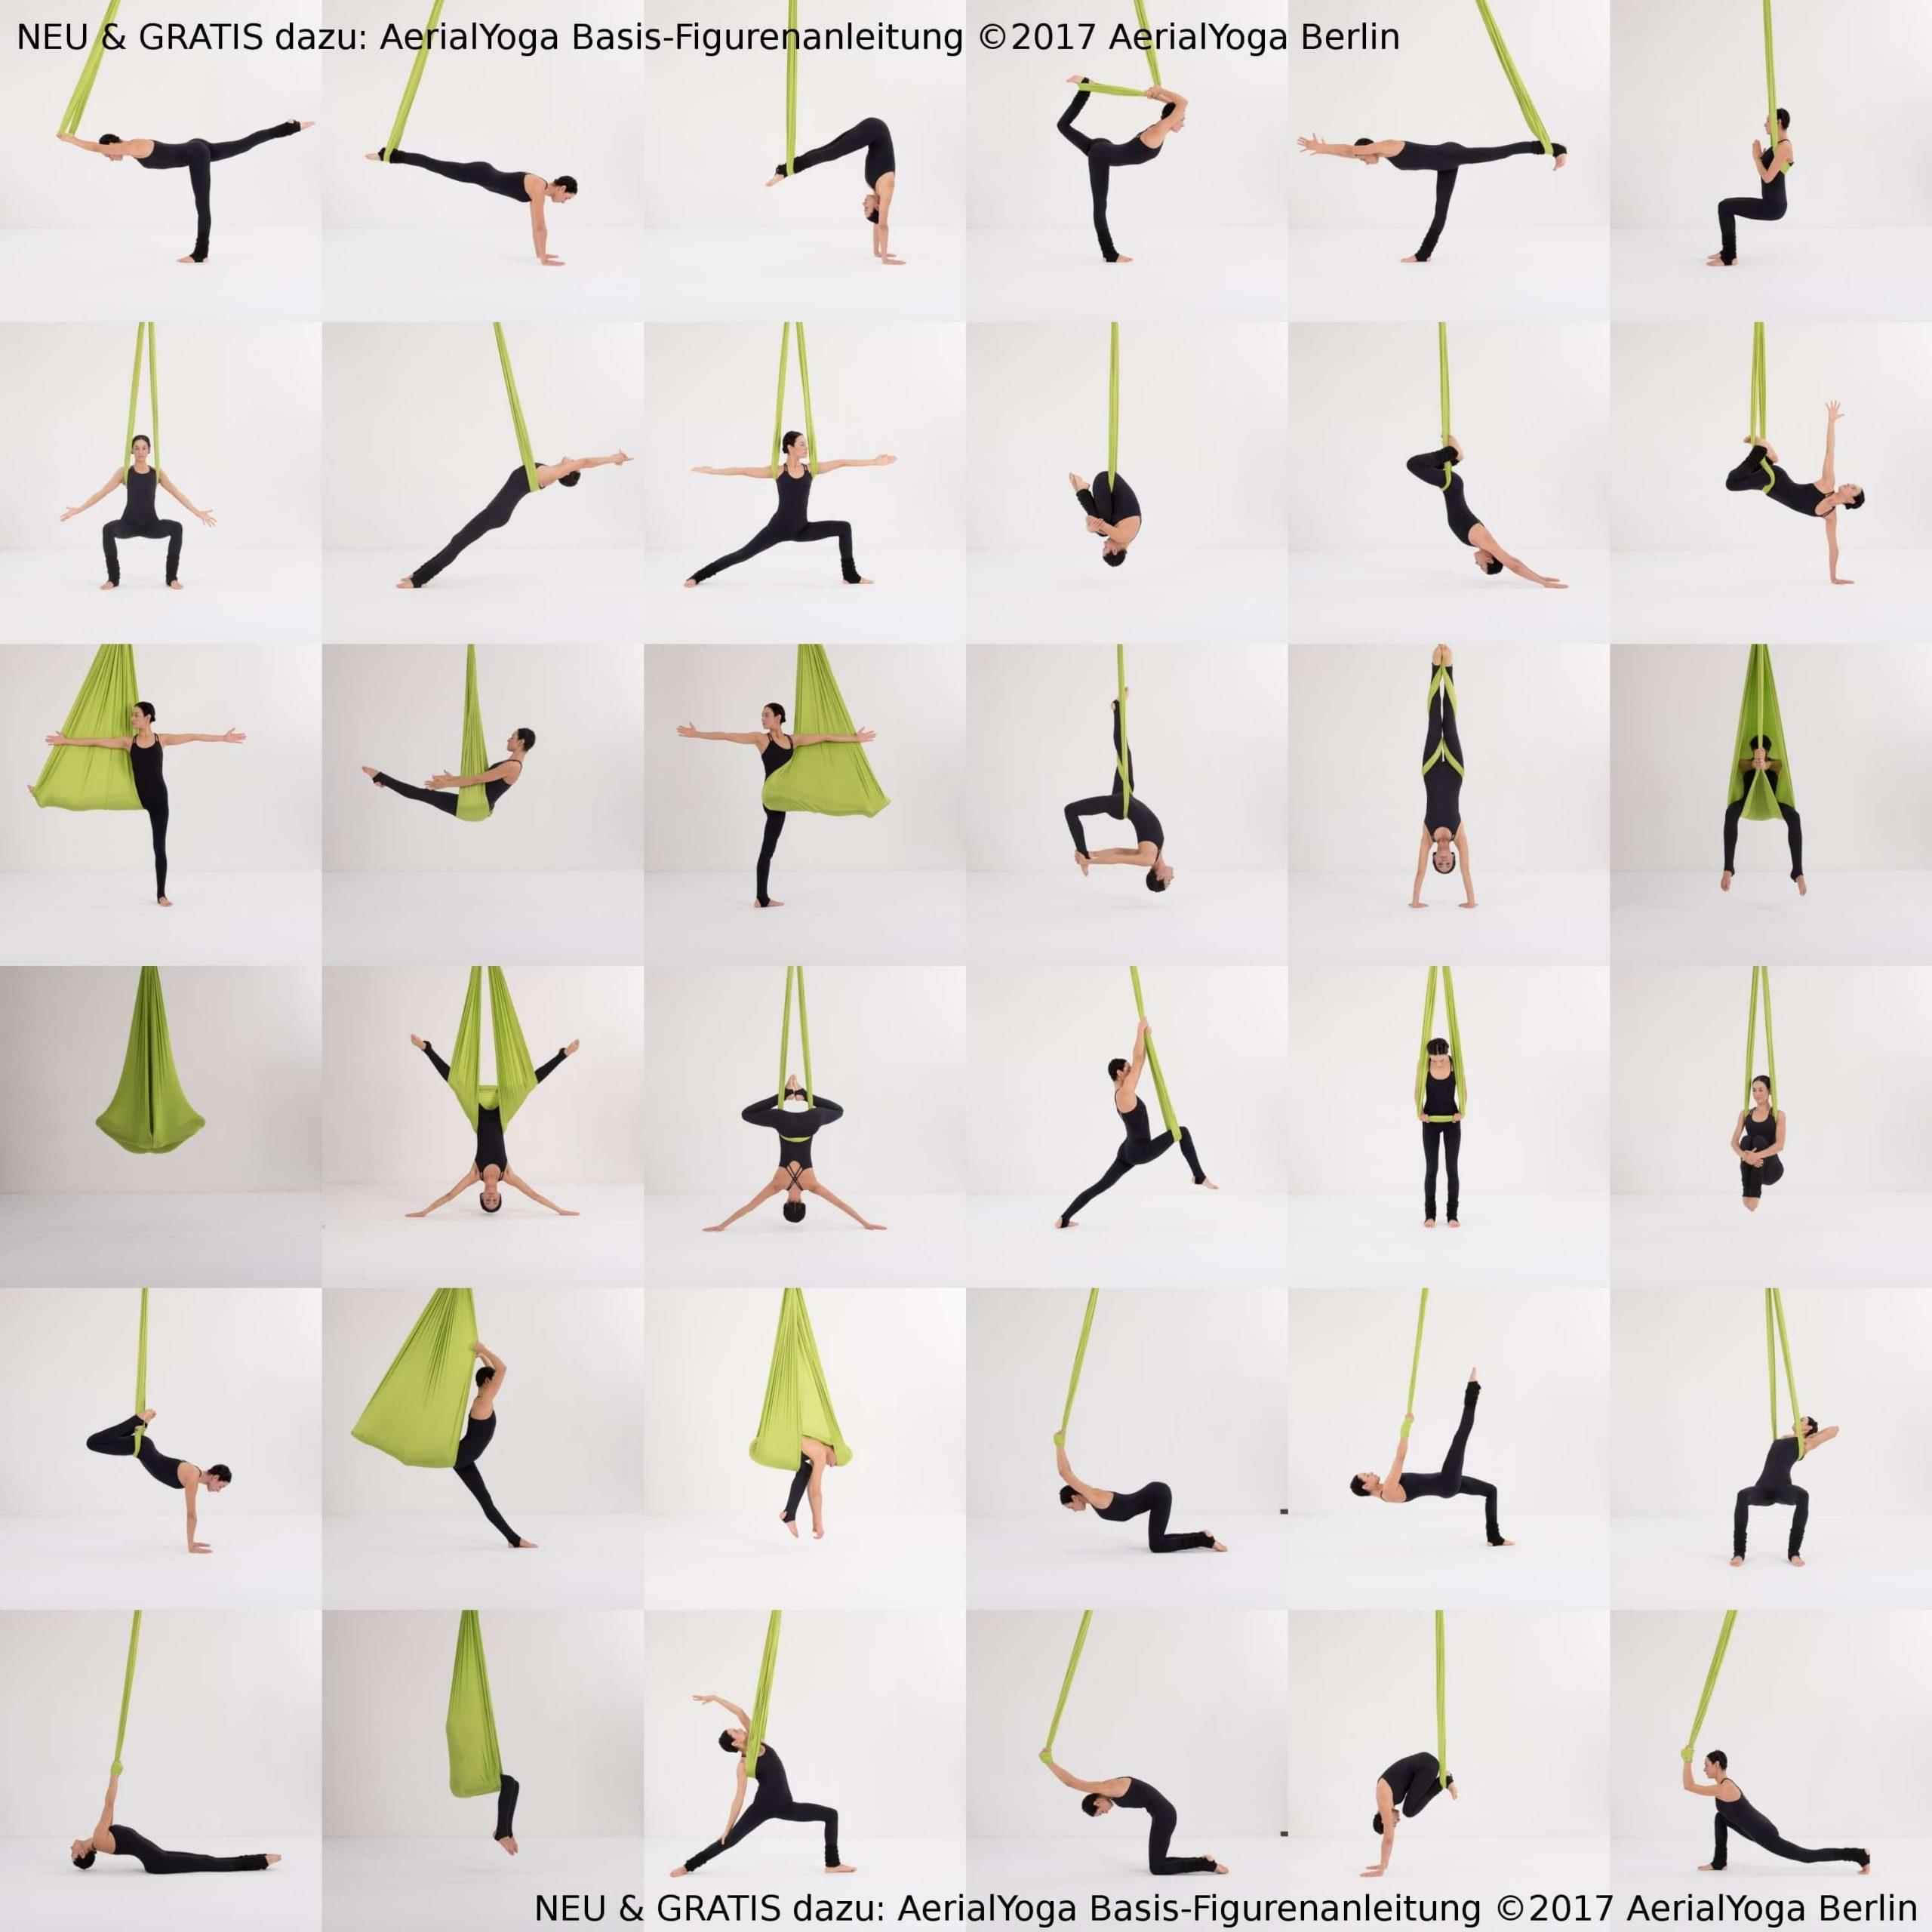 Aerial-Yoga-Poses-Figuren-Asanas-Basis-Uebungen